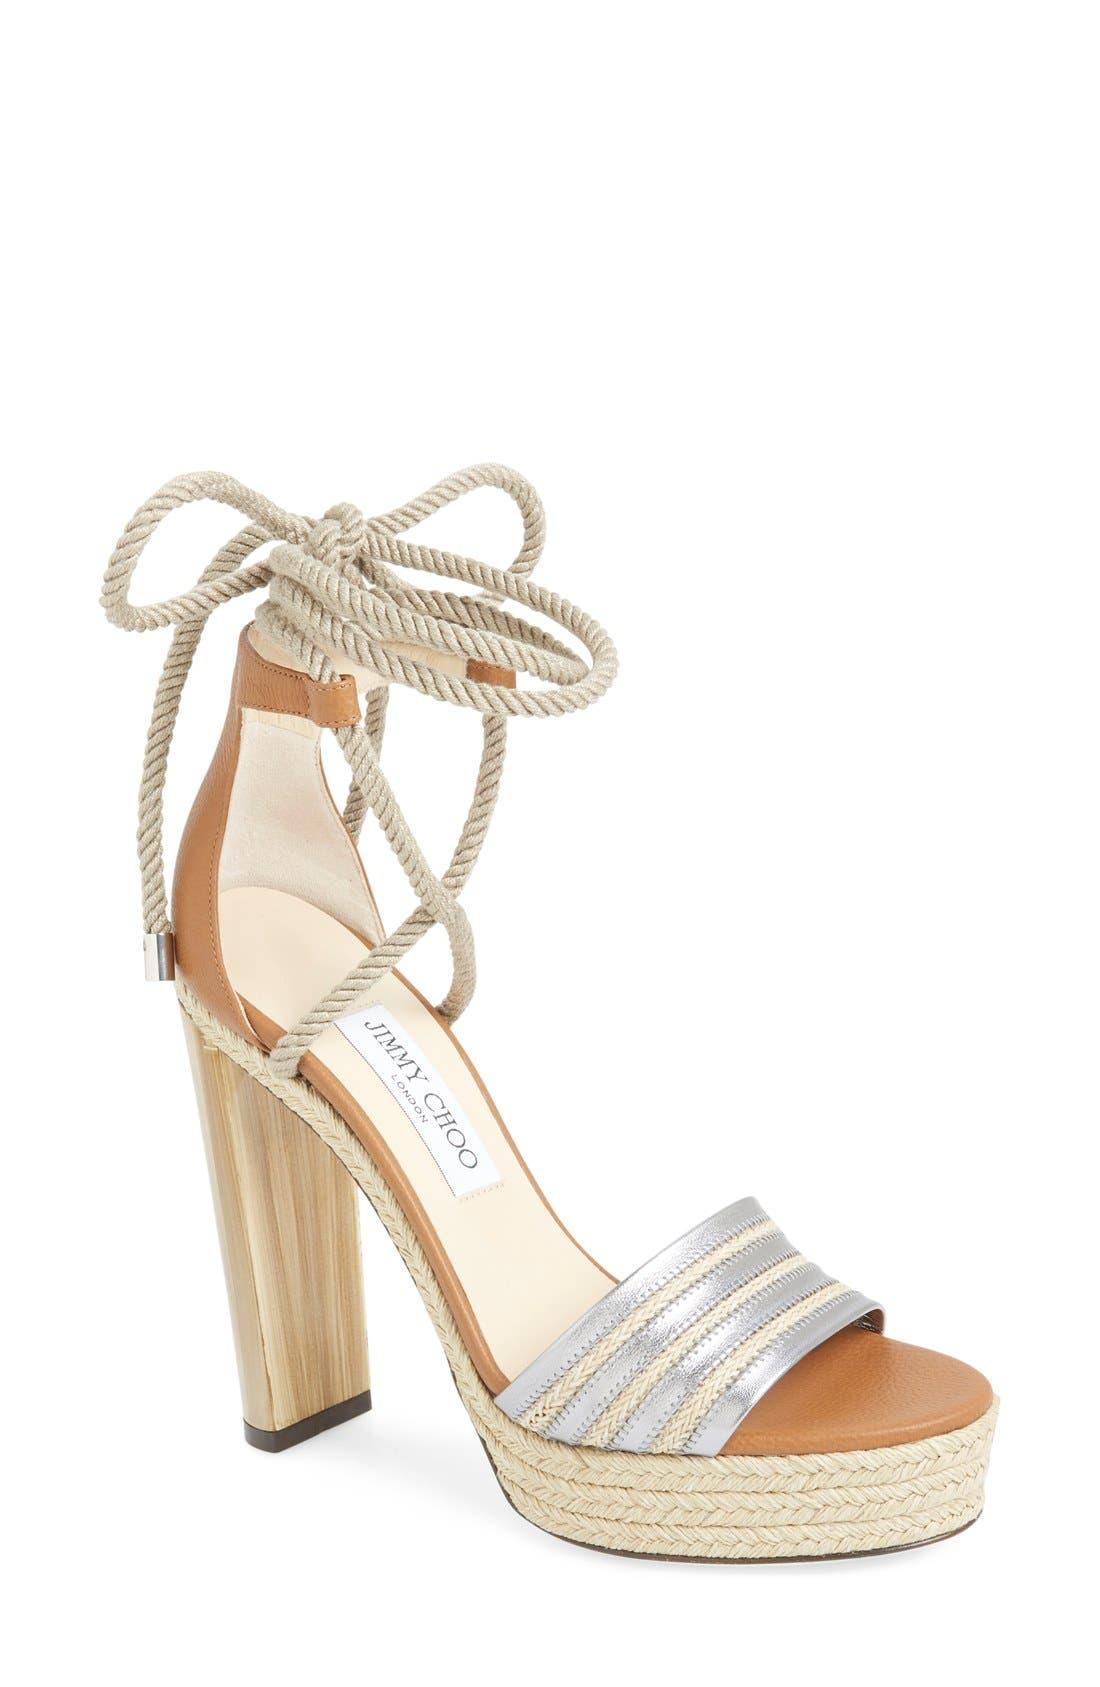 Alternate Image 1 Selected - Jimmy Choo 'Mayje' Platform Sandal (Women)